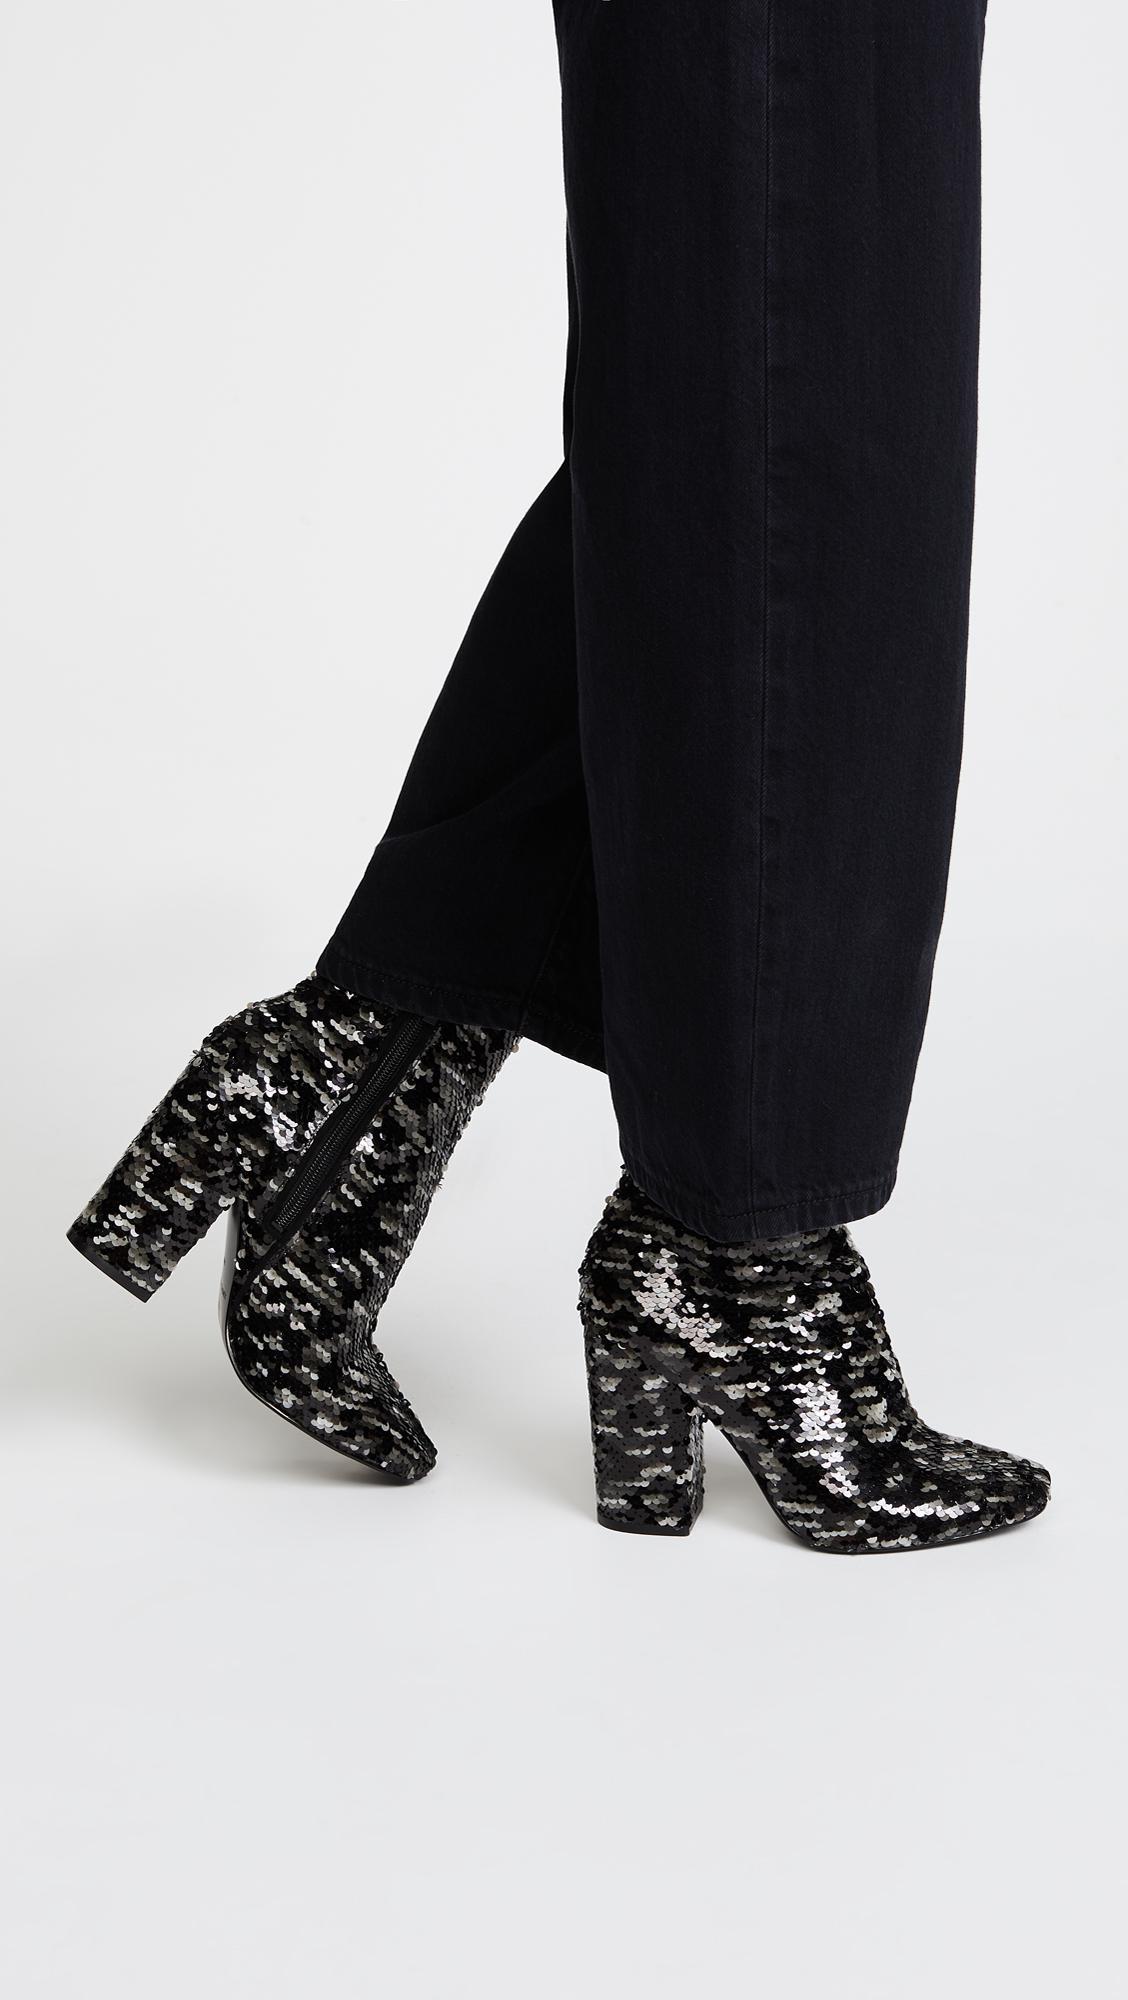 Kendall And Kylie Women's Haedyn Sequined High Block Heel Booties Lqch7ADQ2u